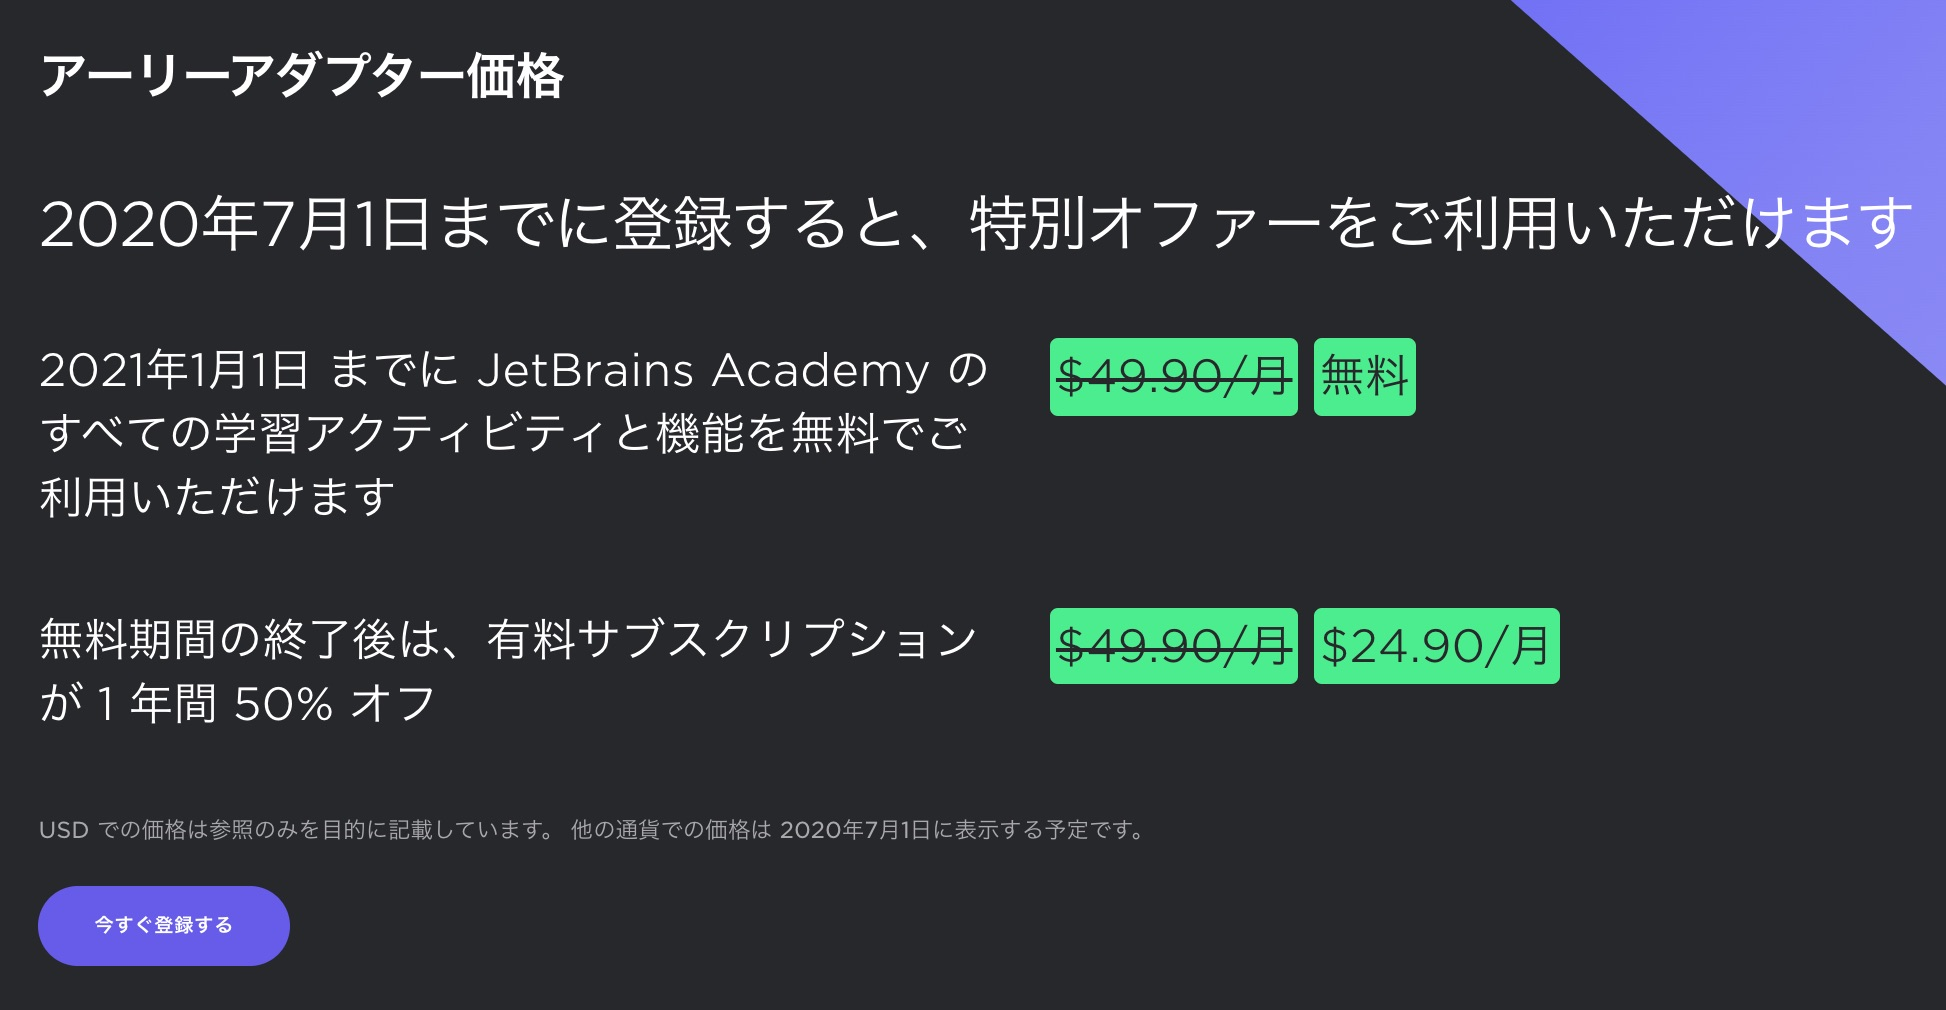 JetBrains Academy - EA offer - blog